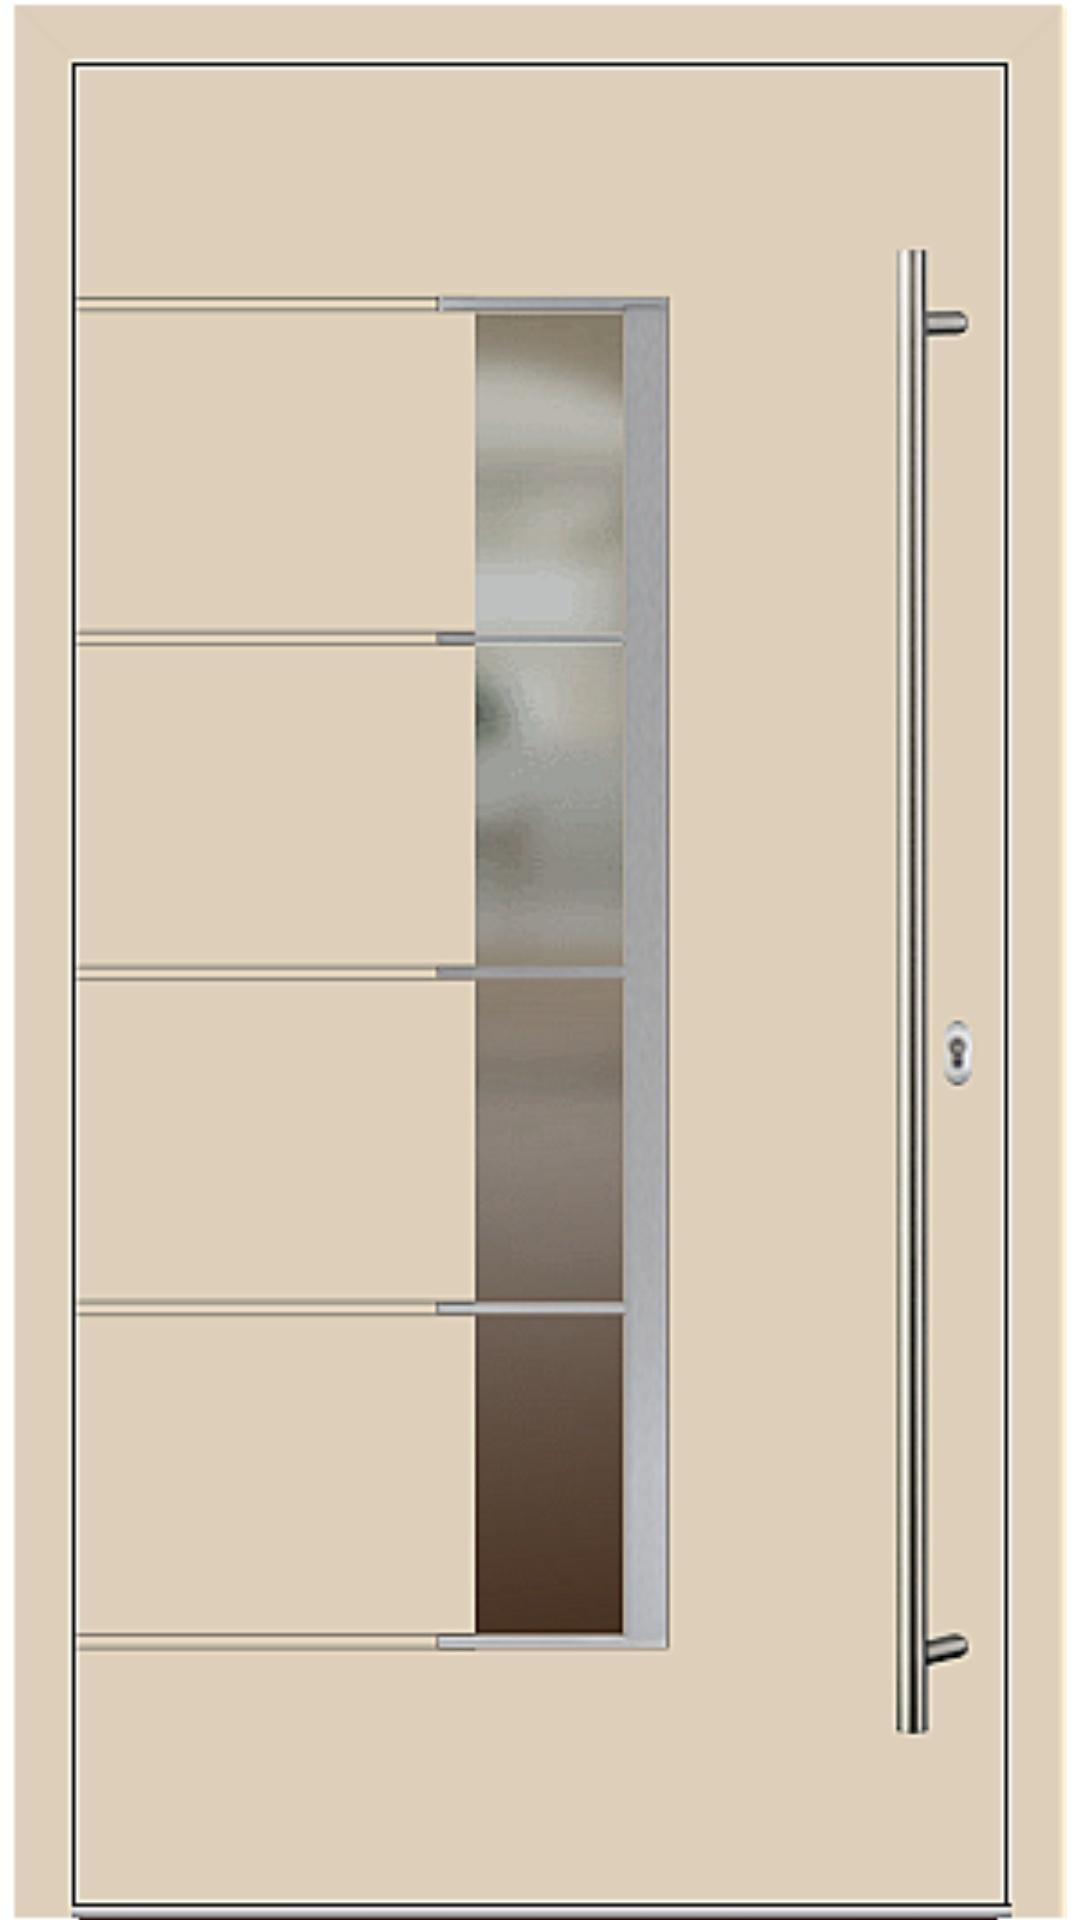 Holz-Alu Haustür Modell 66570 beige